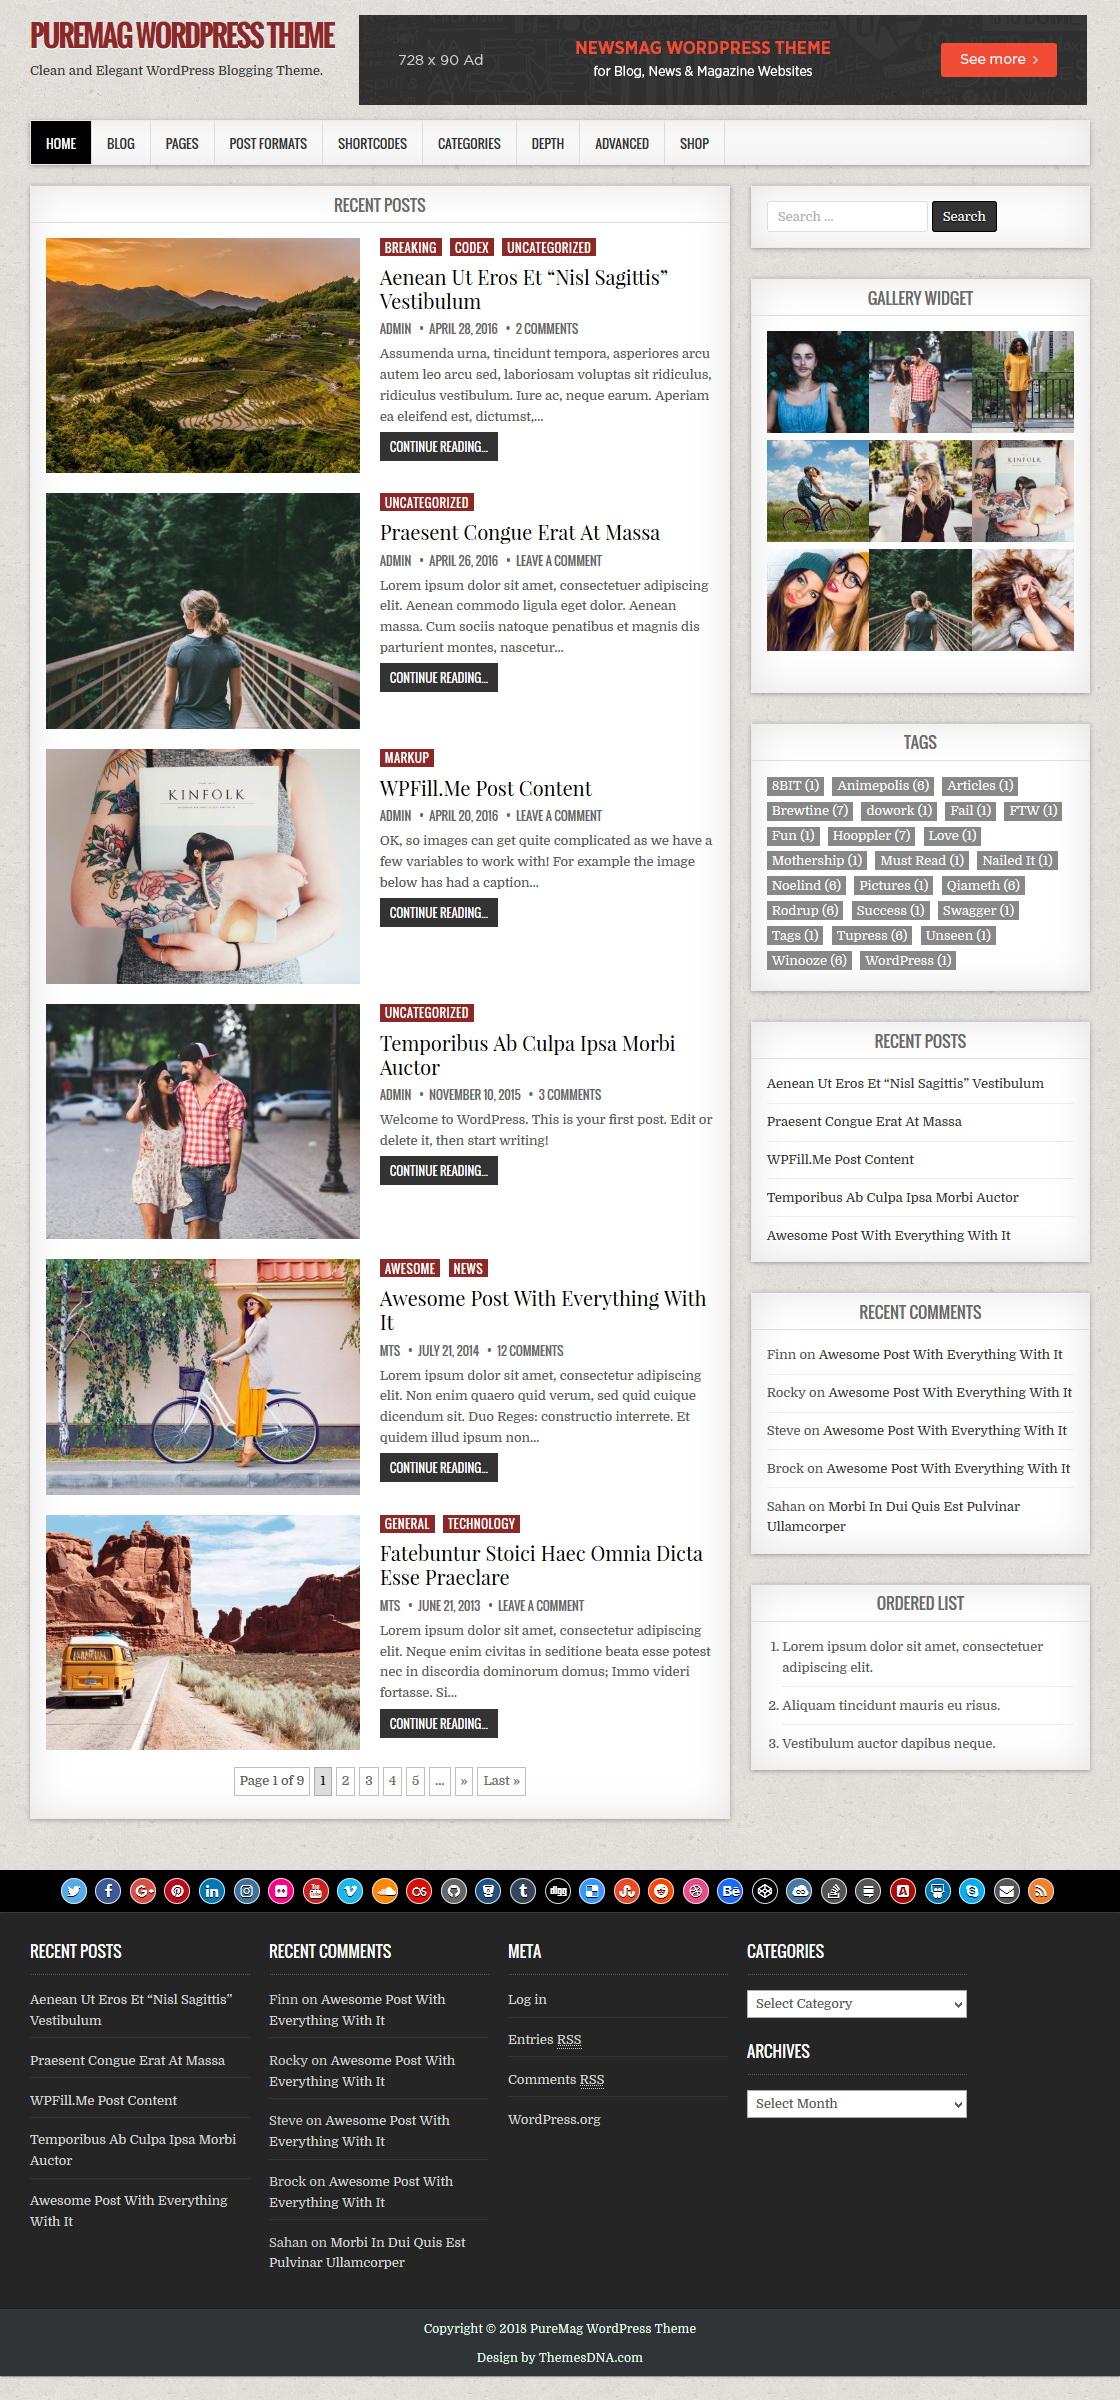 PureMag WordPress Theme - ThemesDNA.com